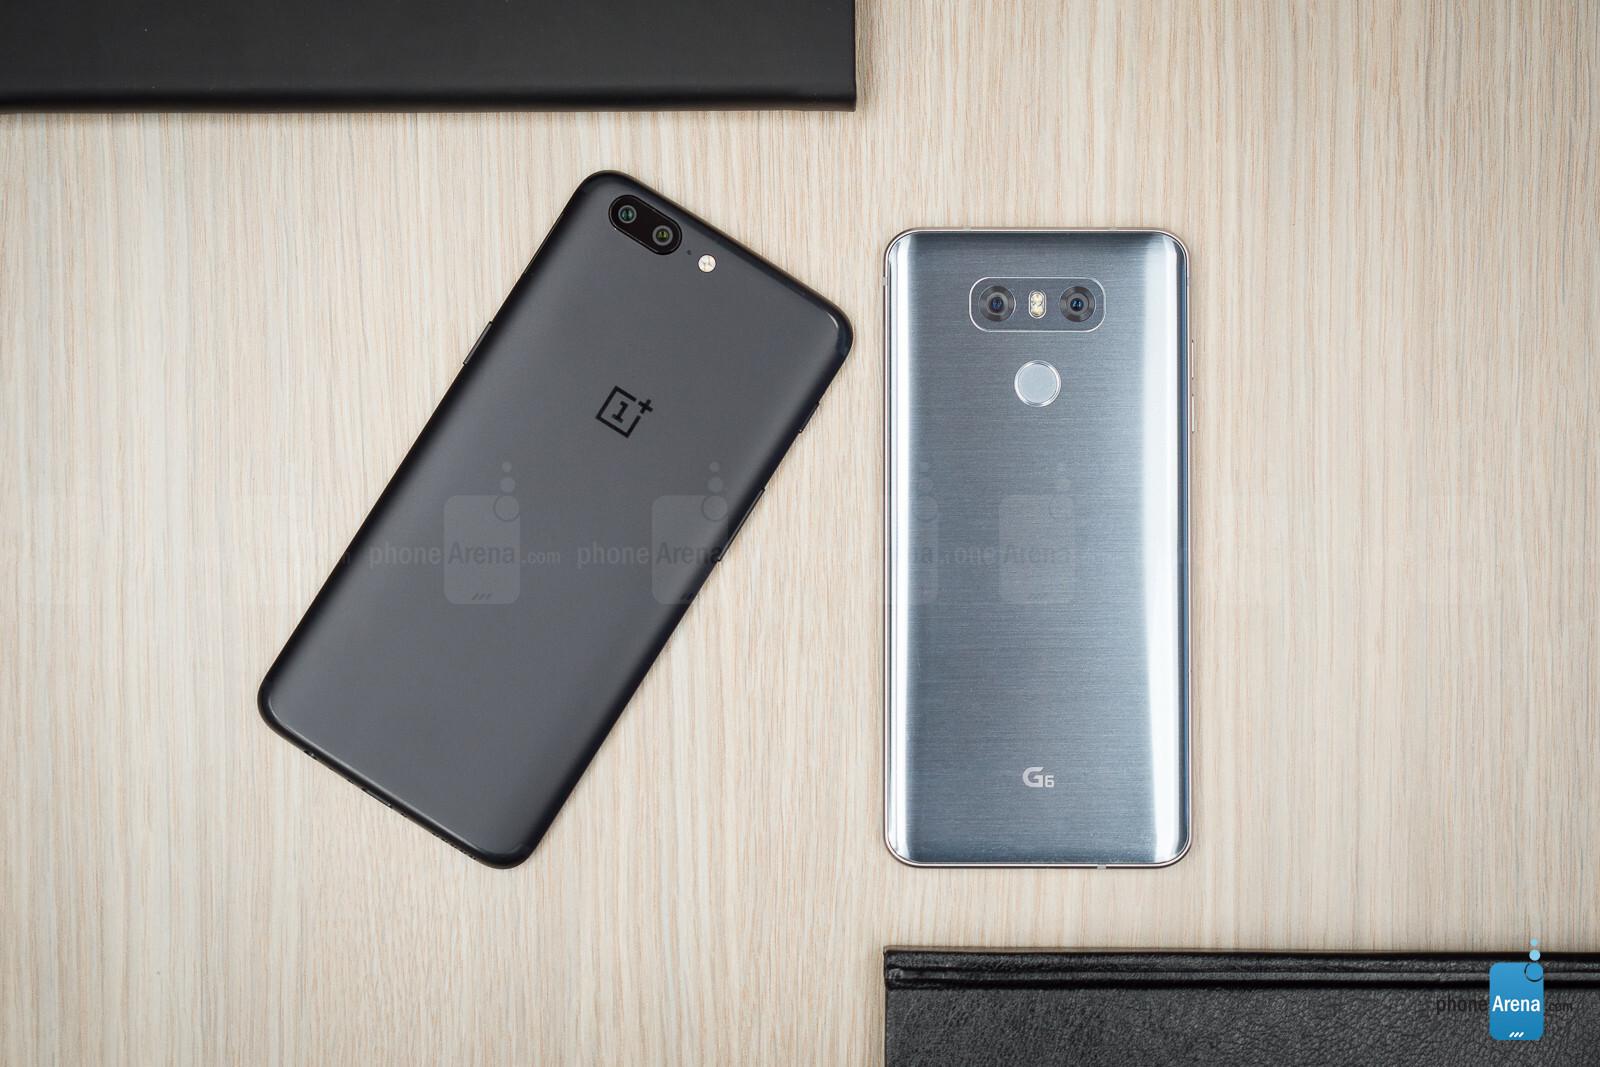 OnePlus 5 vs LG G6 - PhoneArena